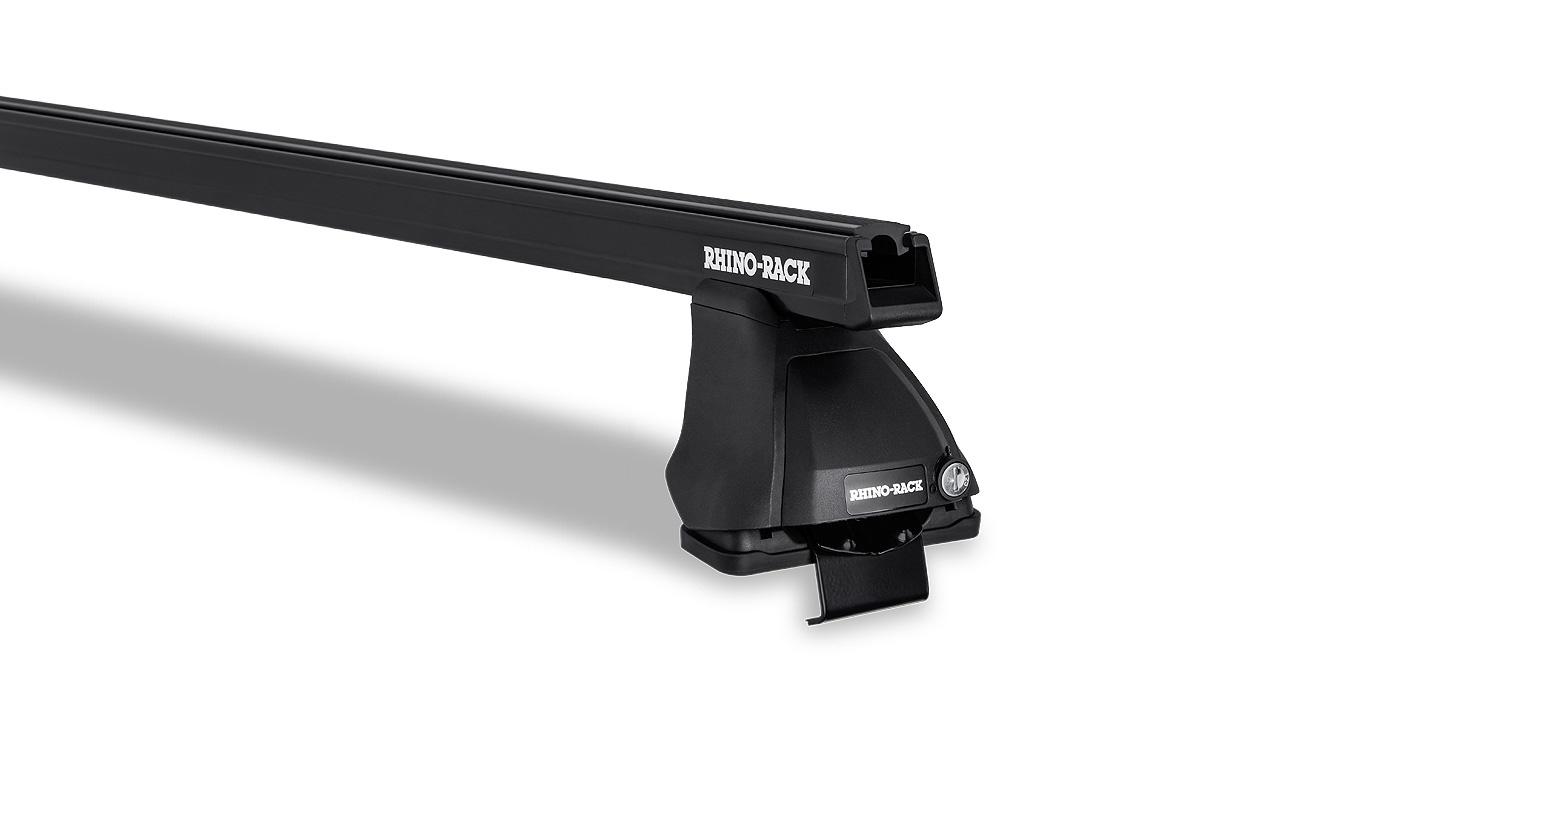 Rhino Rack Heavy Duty 2500 Black 1 Bar Roof Rack